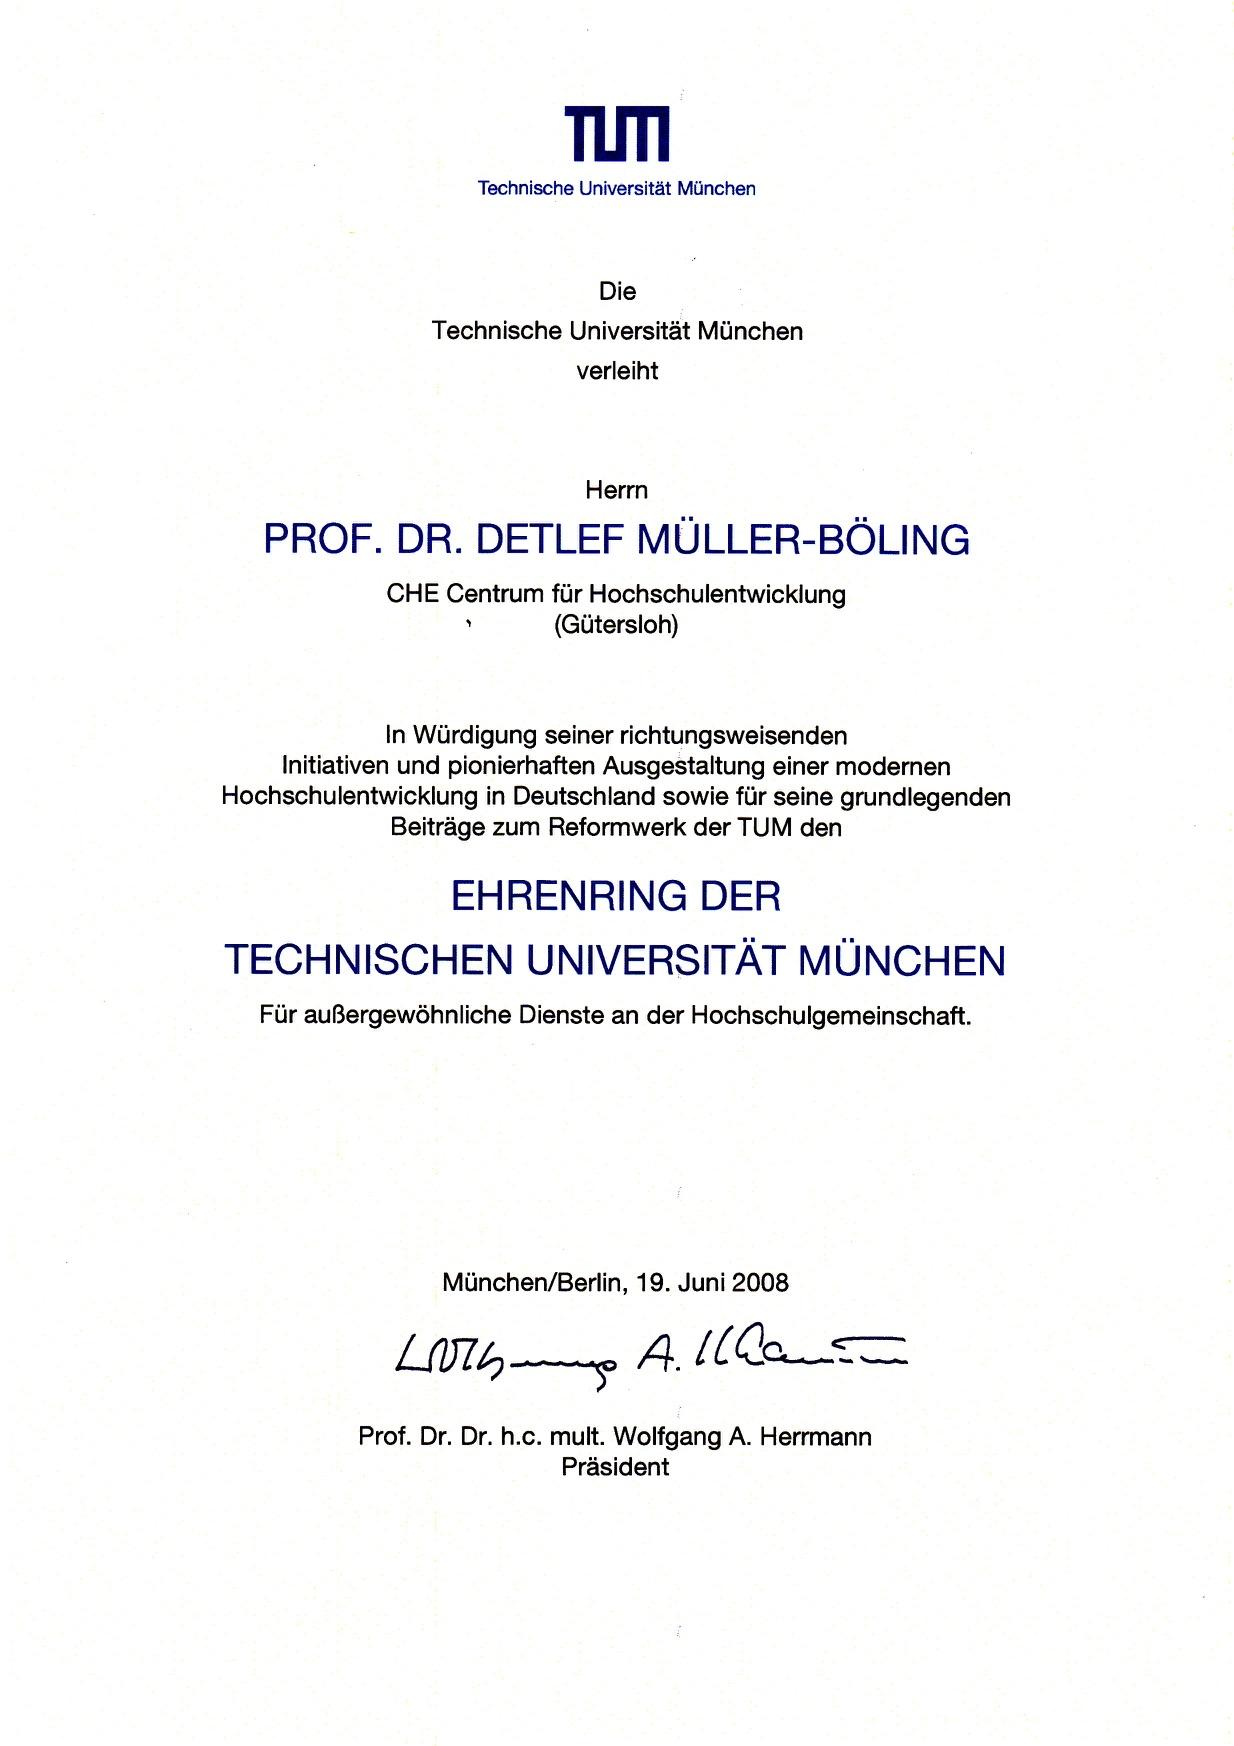 2008_06_19 Urkunde Ehrenring TUM